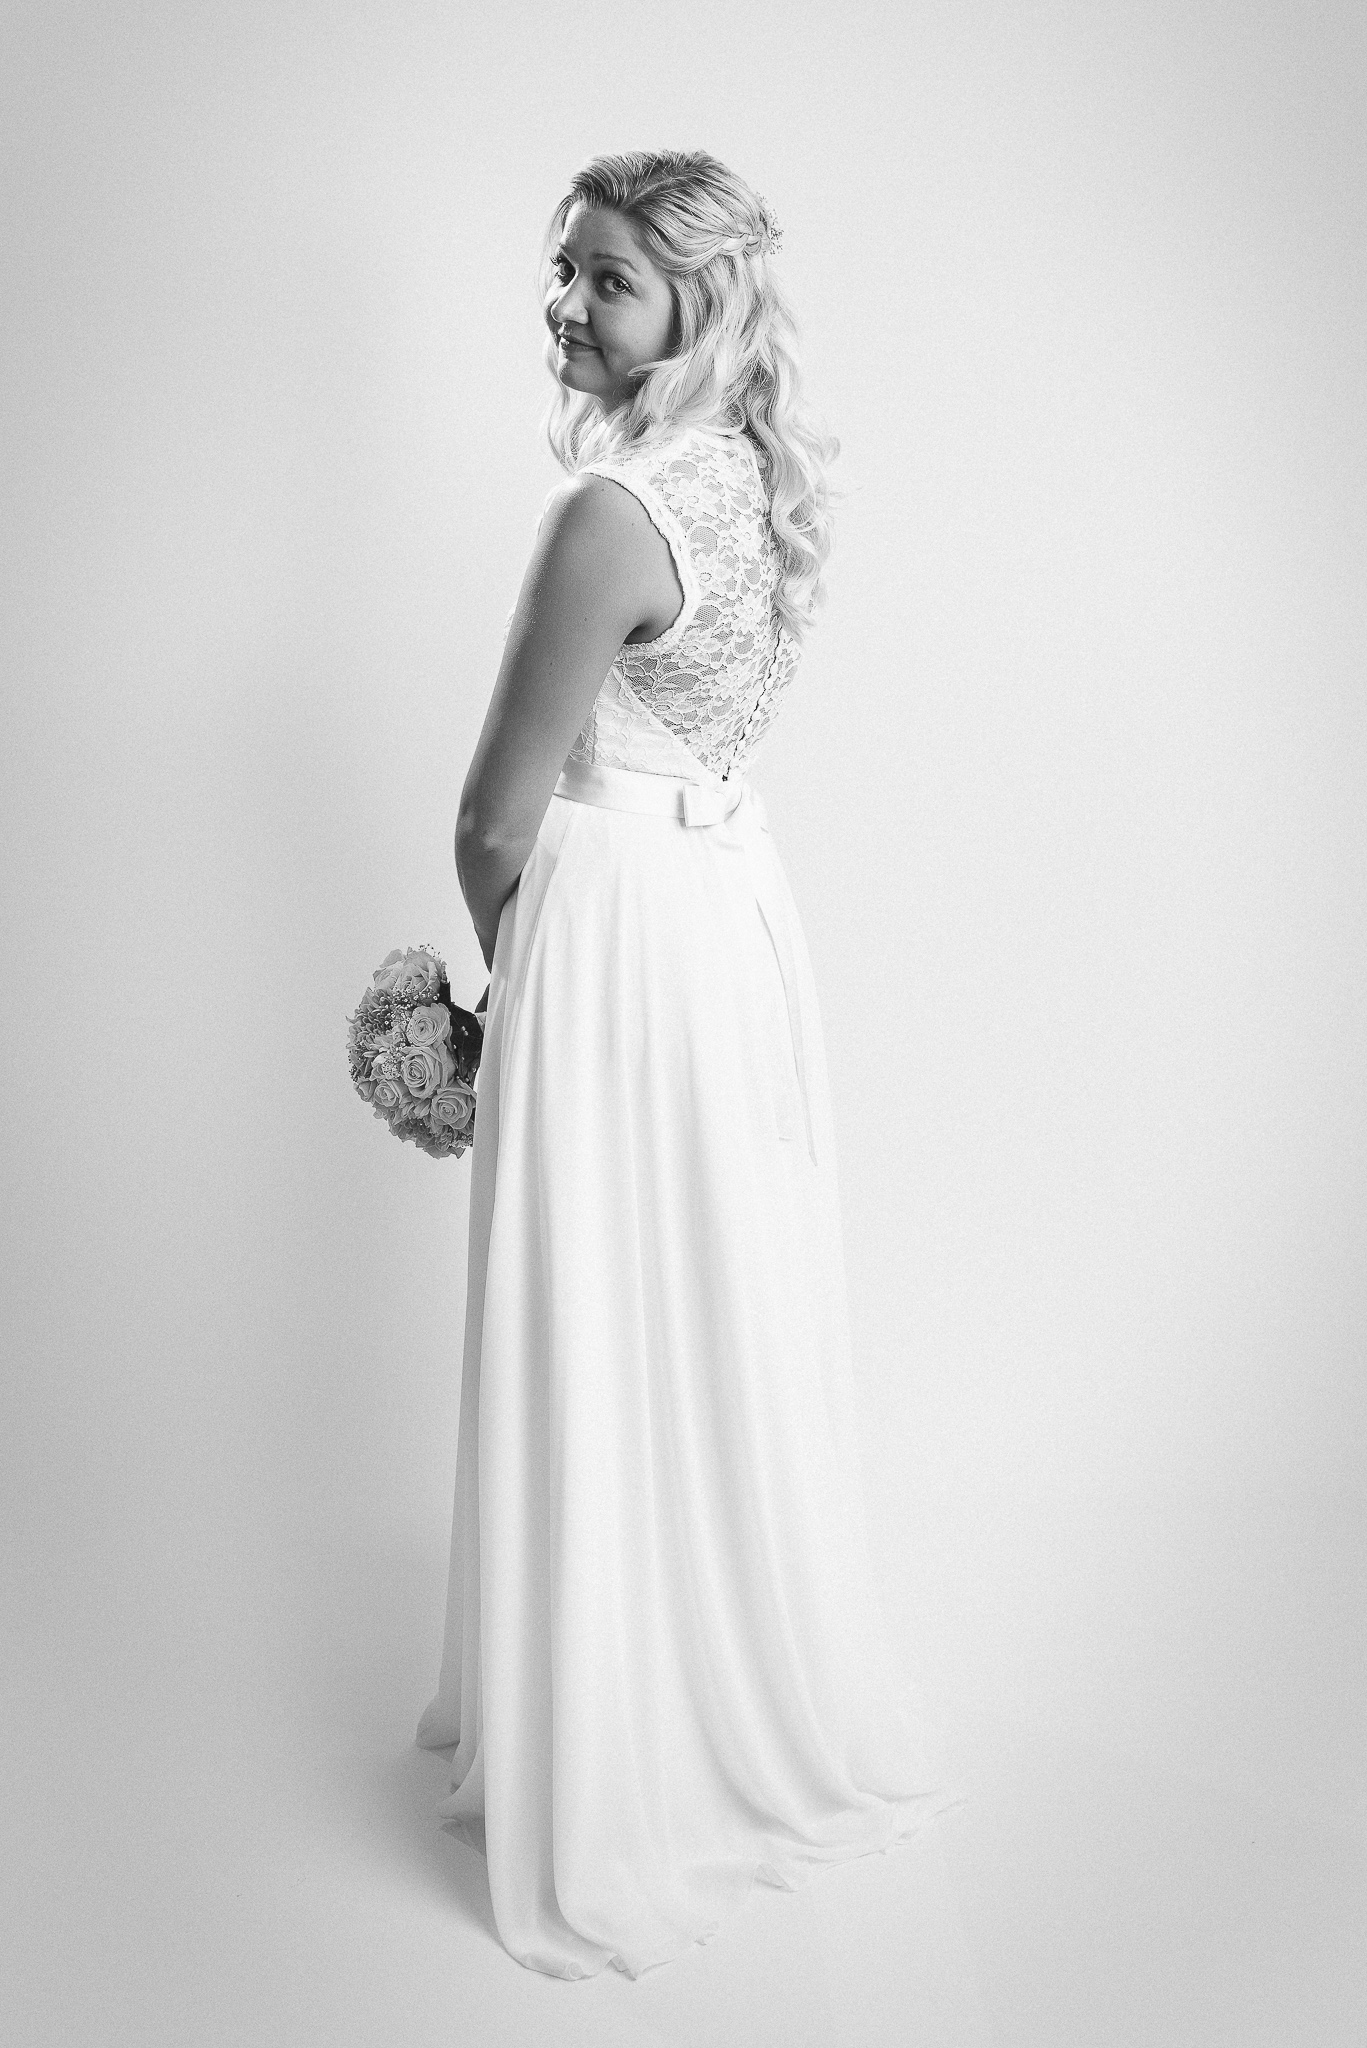 SJ-Bryllup-20141025-Portraits-017.jpg